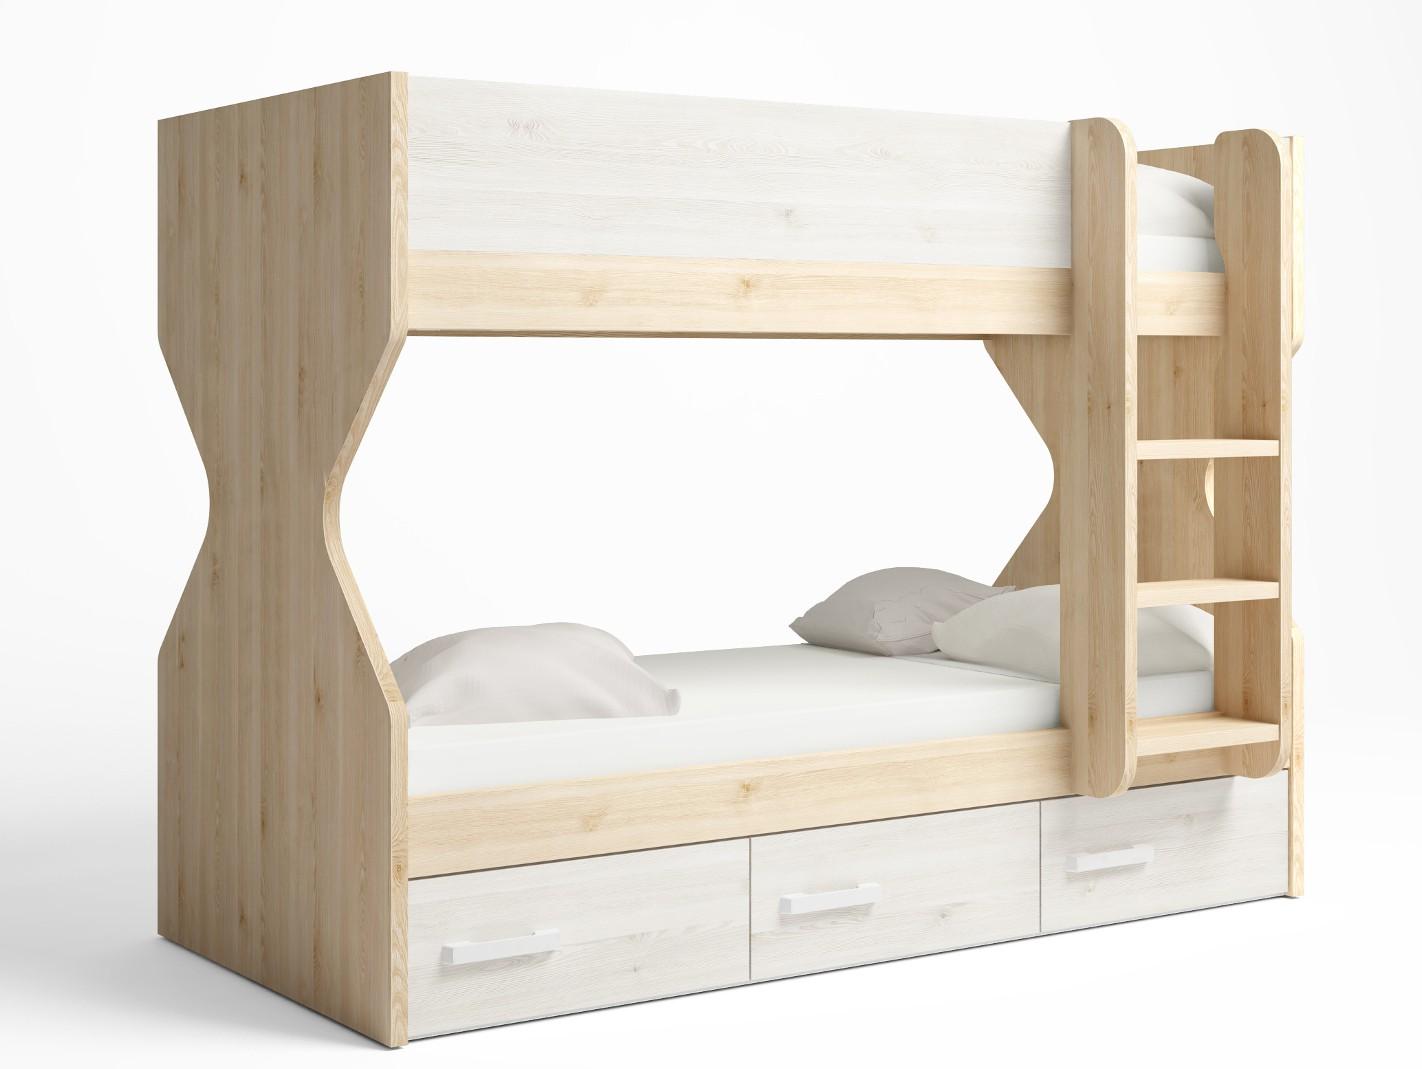 Inicio u0026gt; Dormitorios Juveniles u0026gt; Litera L-13439998